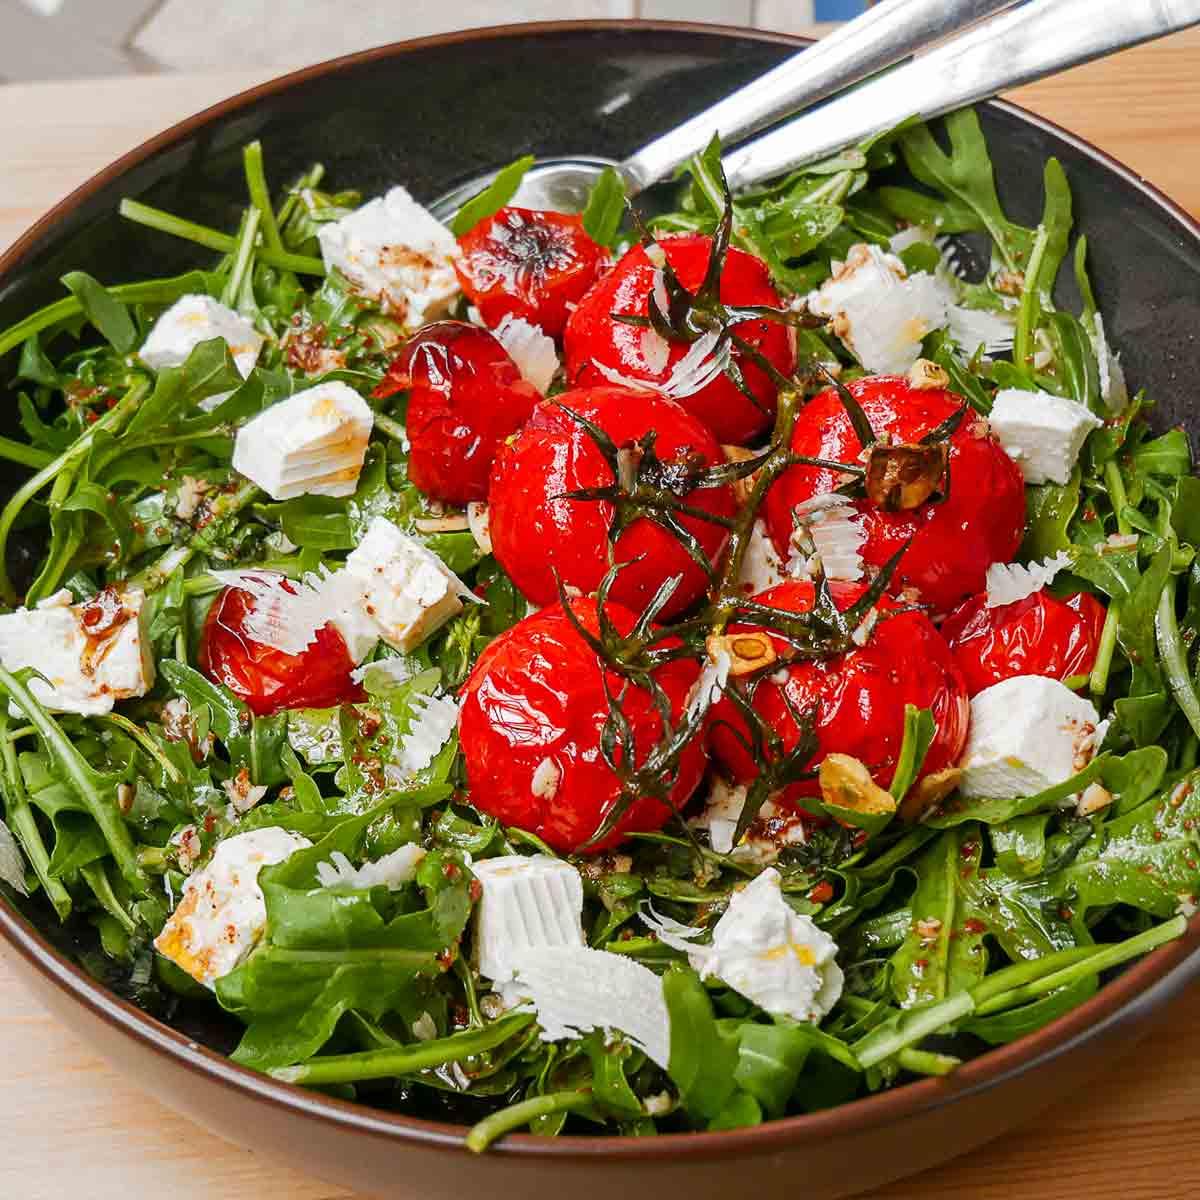 KochDichEM: Türkei vs. Italien Salat mit Gerösteten Tomaten ~ Fırınlanmış domates salatası, Spaghetti Pastırmara, KochDichEM, 2020, Fußball EM 2021